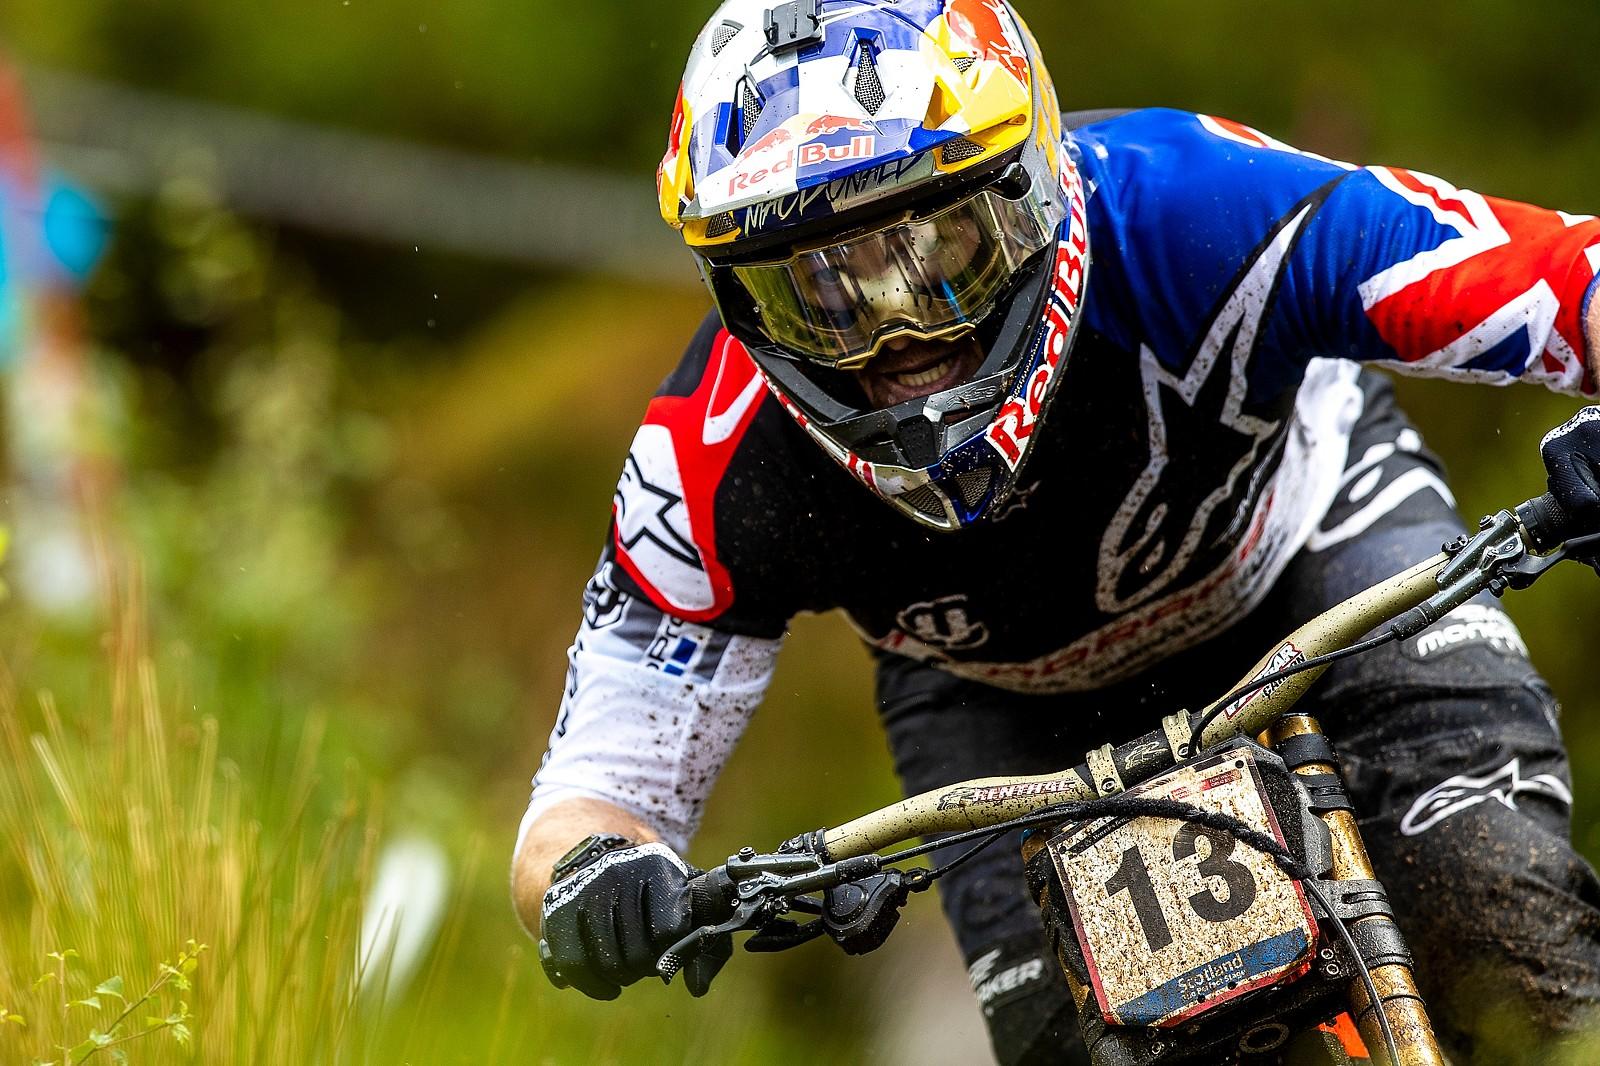 Grit, Focus - Brook Macdonald - A Big Bad Batch of Brook Macdonald Bangers - Mountain Biking Pictures - Vital MTB